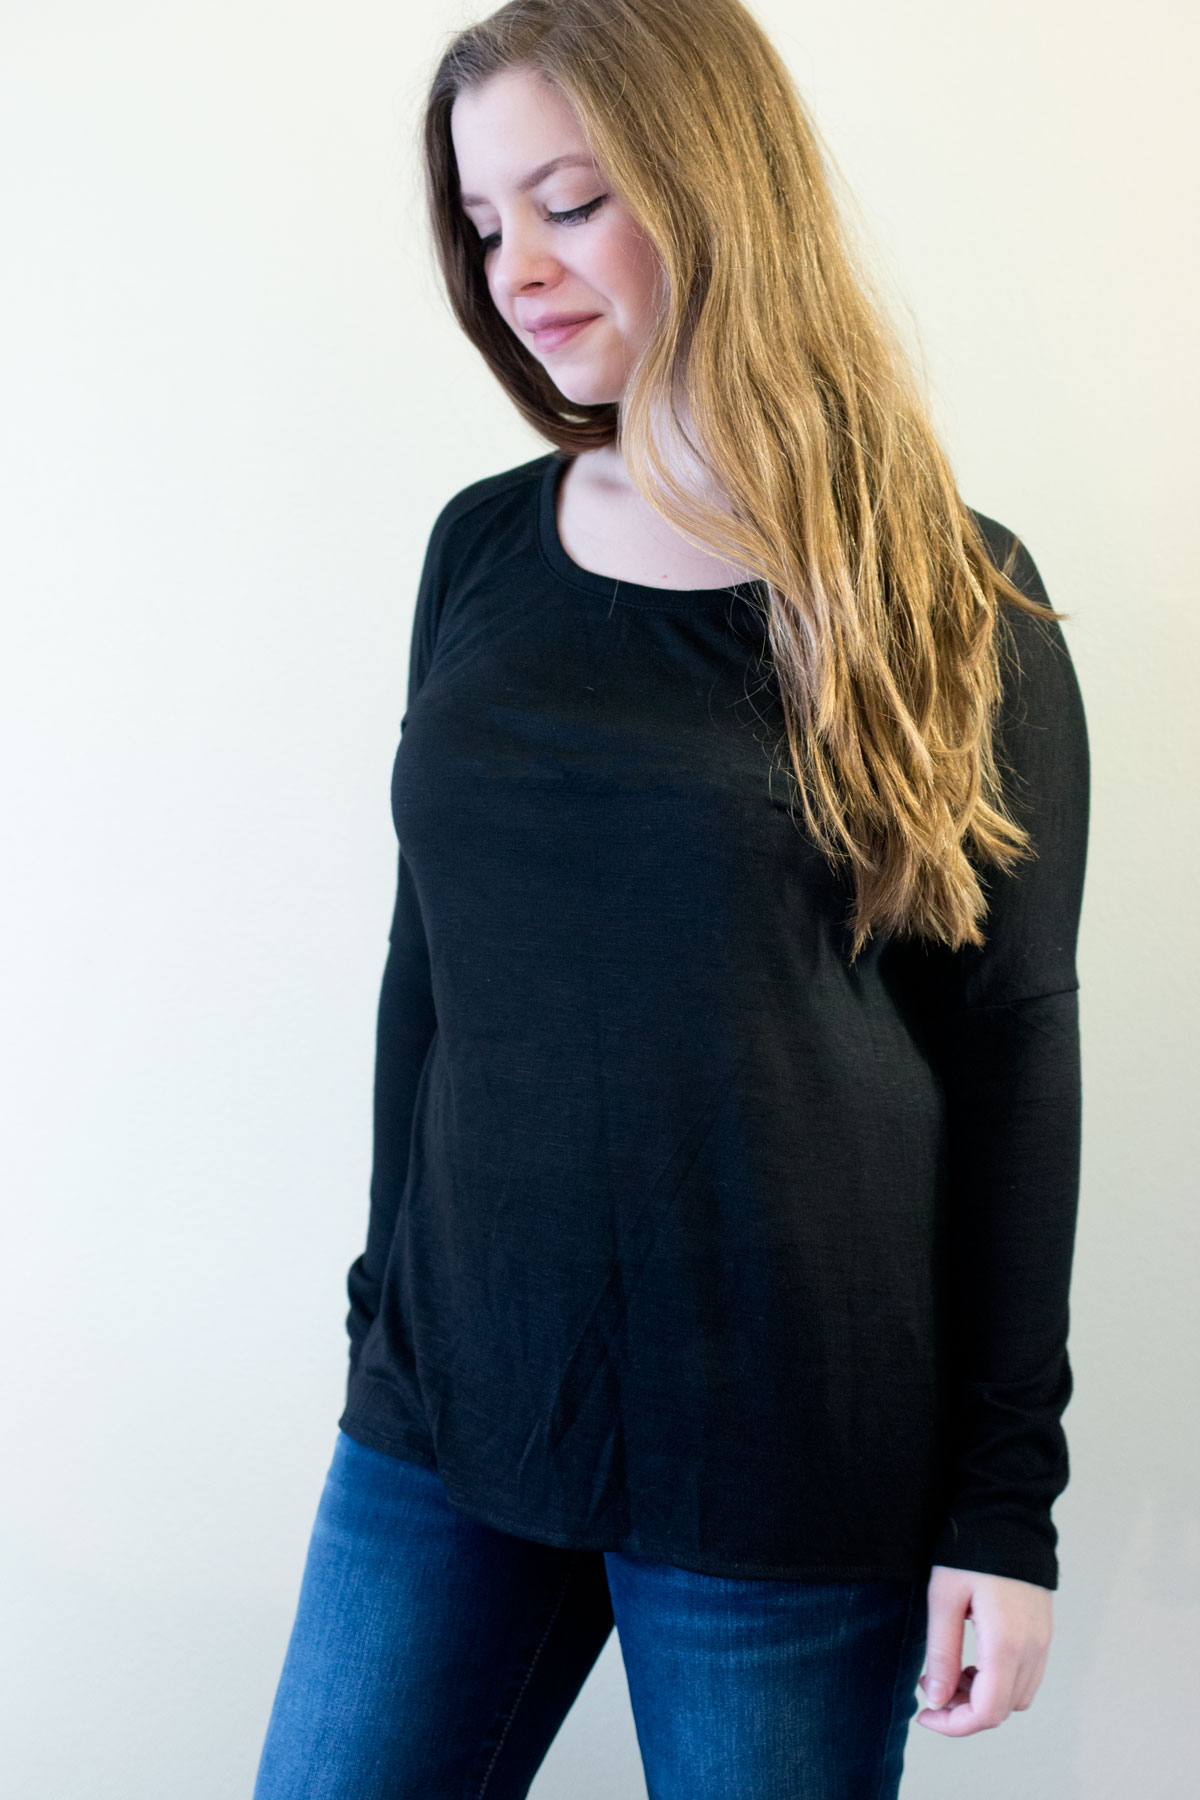 Wantable Style Edit // Jack by BB Dakota Lavi Top in Black // Hello Rigby Seattle Fashion & Style Blog